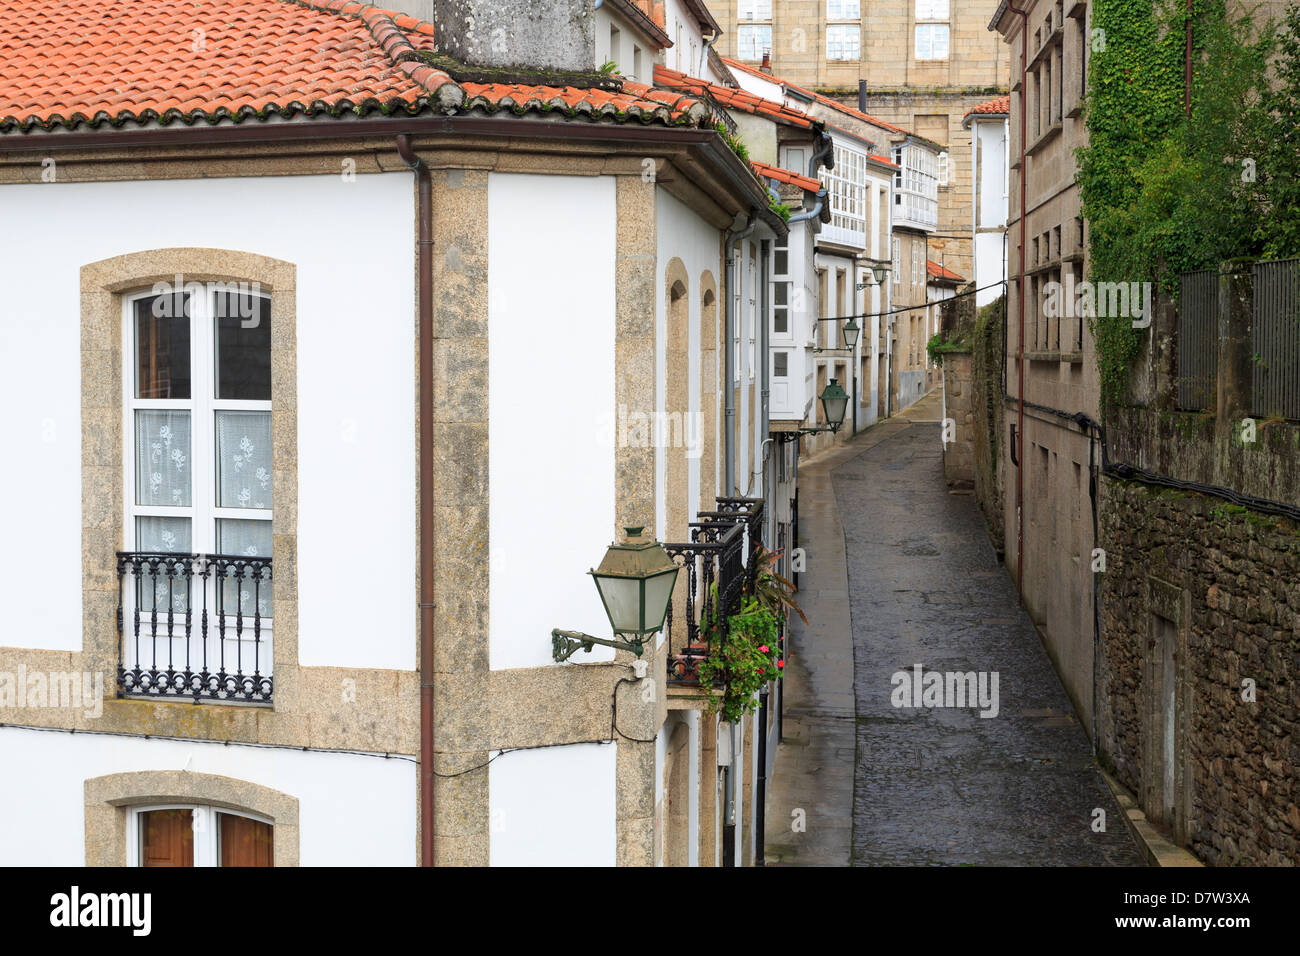 Franco Street in Old Town, Santiago de Compostela, Galicia, Spain - Stock Image